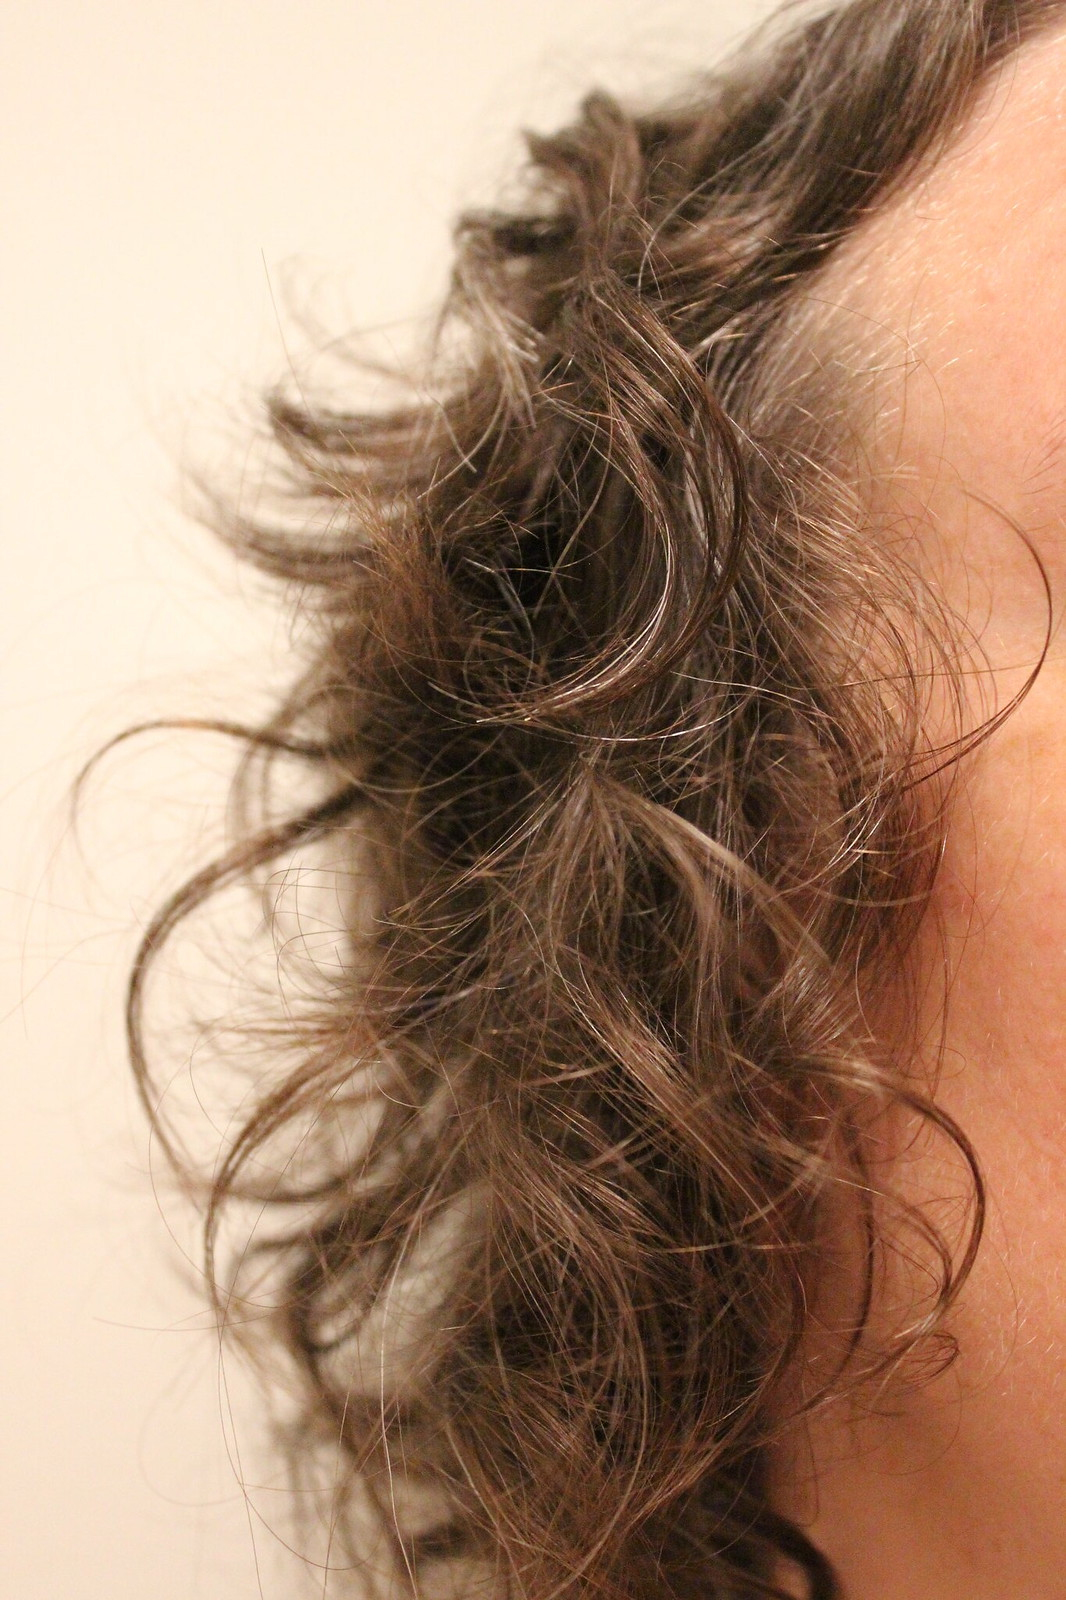 Rain hair / etdrysskanel.com